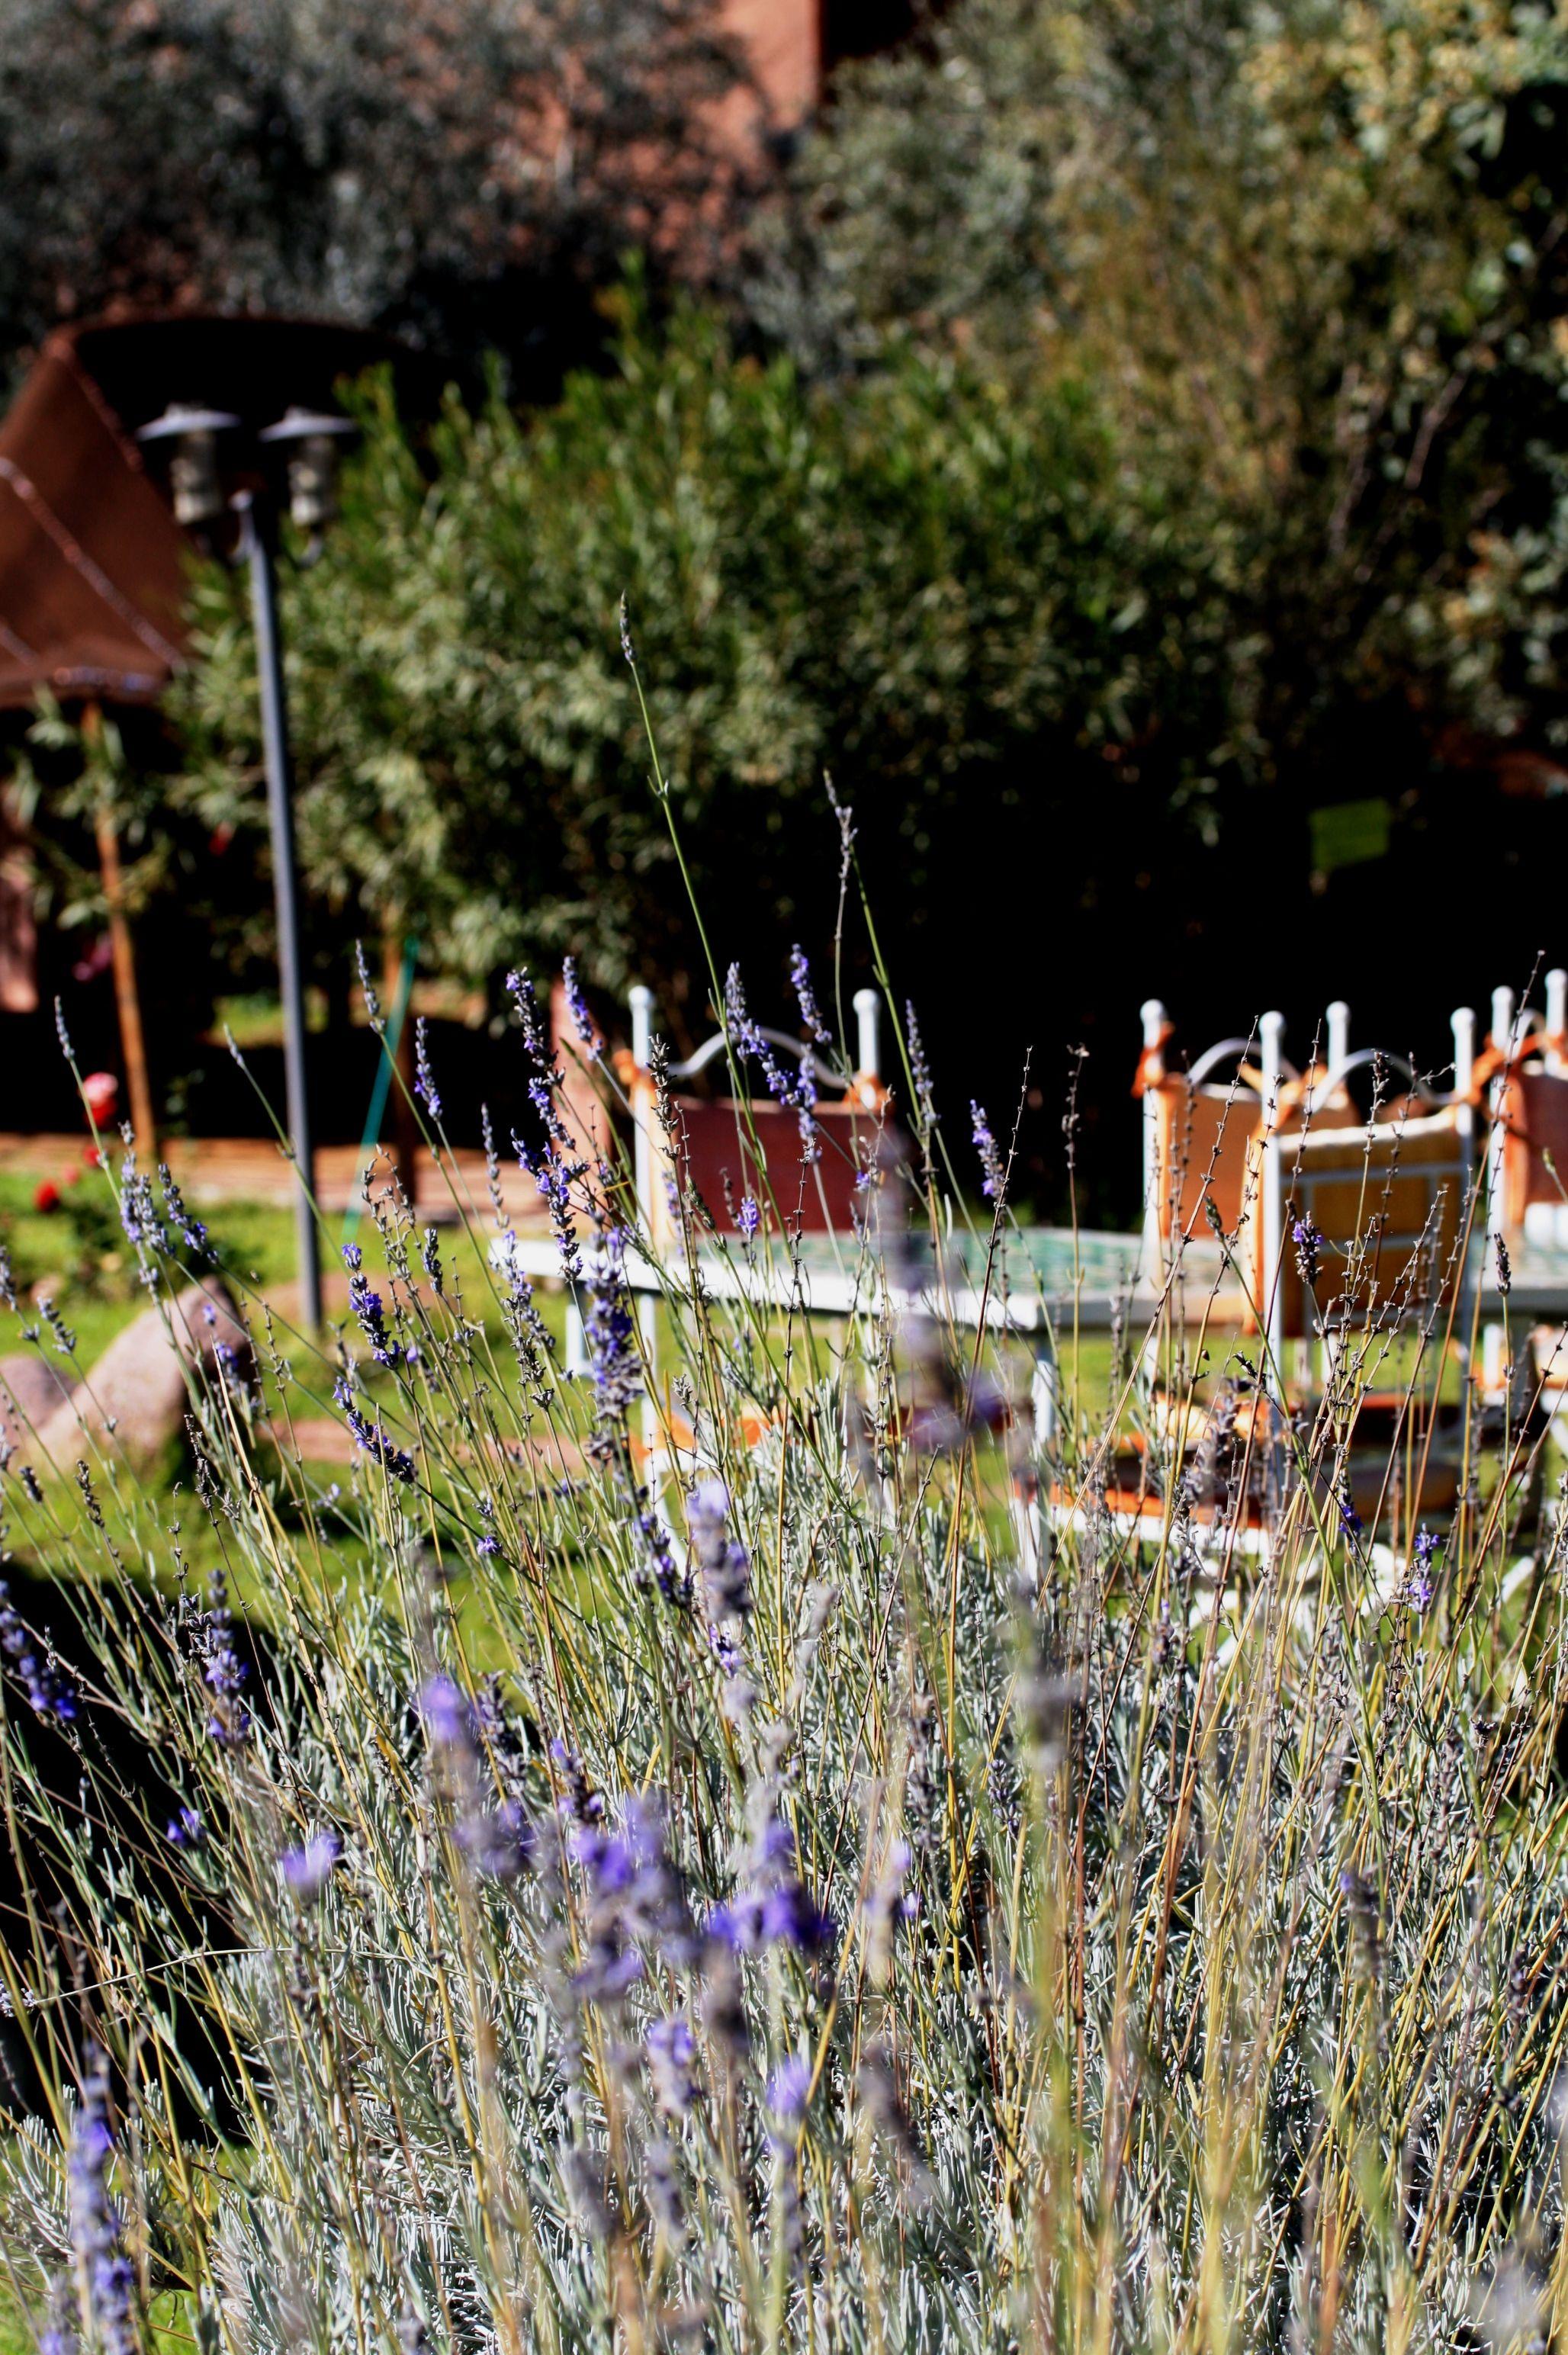 jardin bio aromatique dourika 35km de marrakech - Jardin Bio